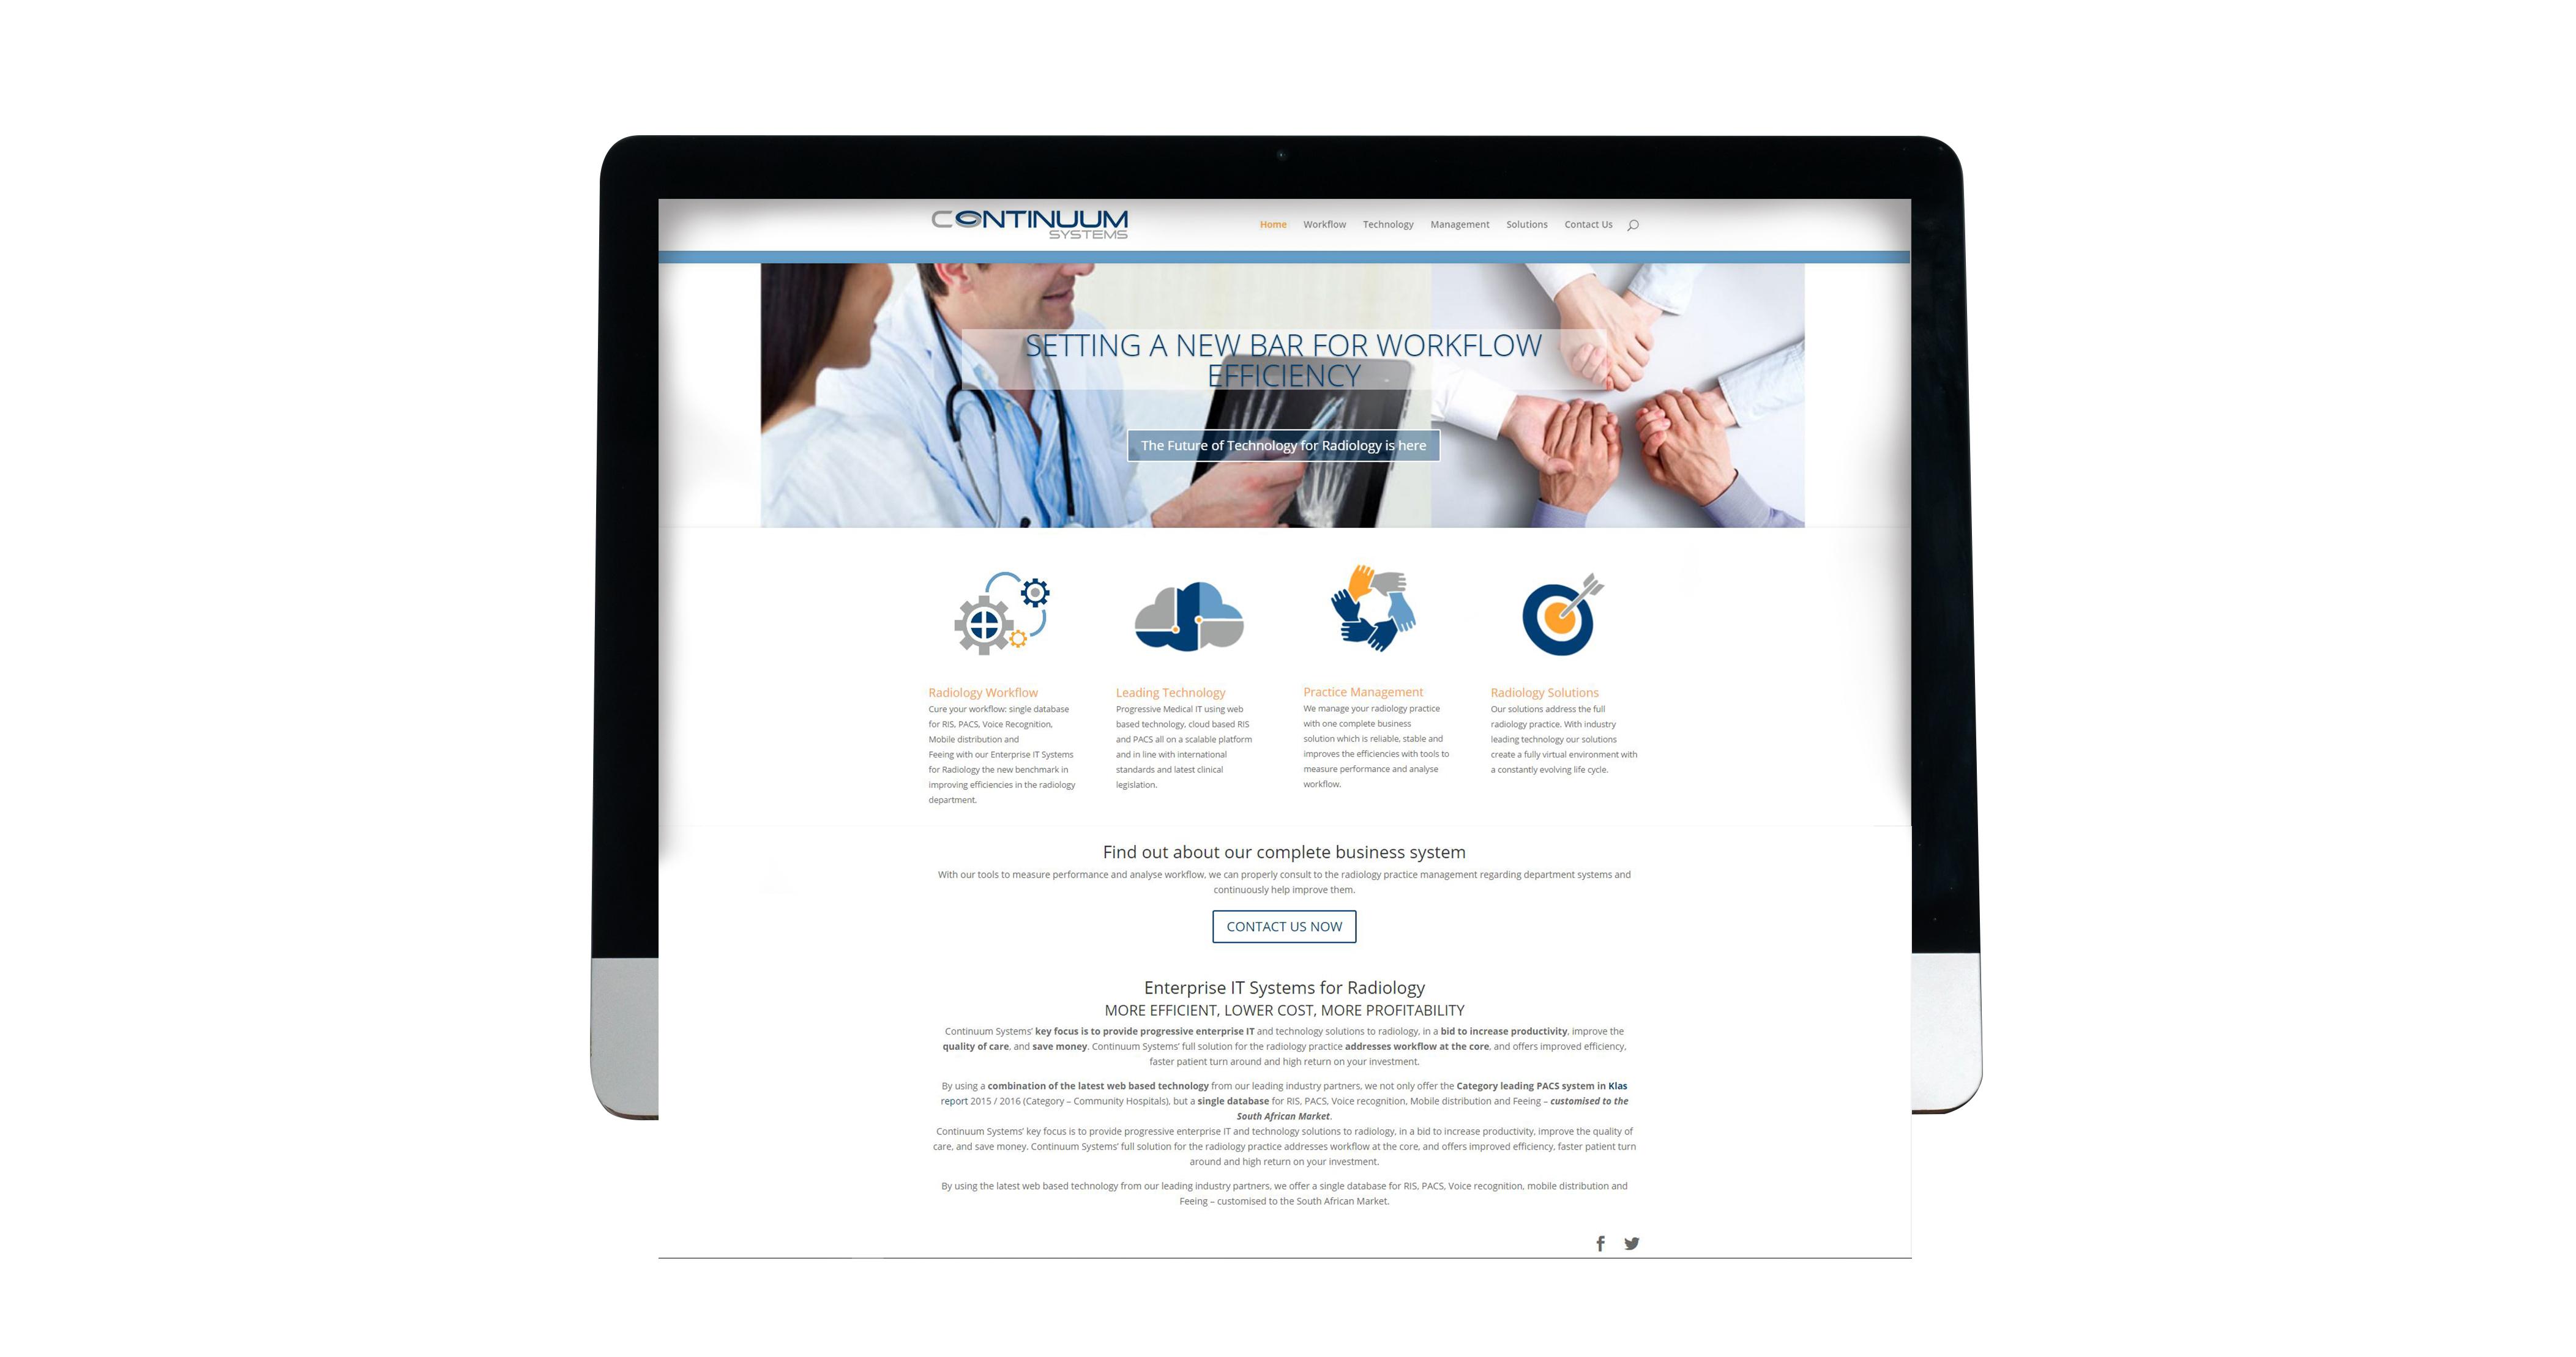 Continuum Systems website design radiology workflow